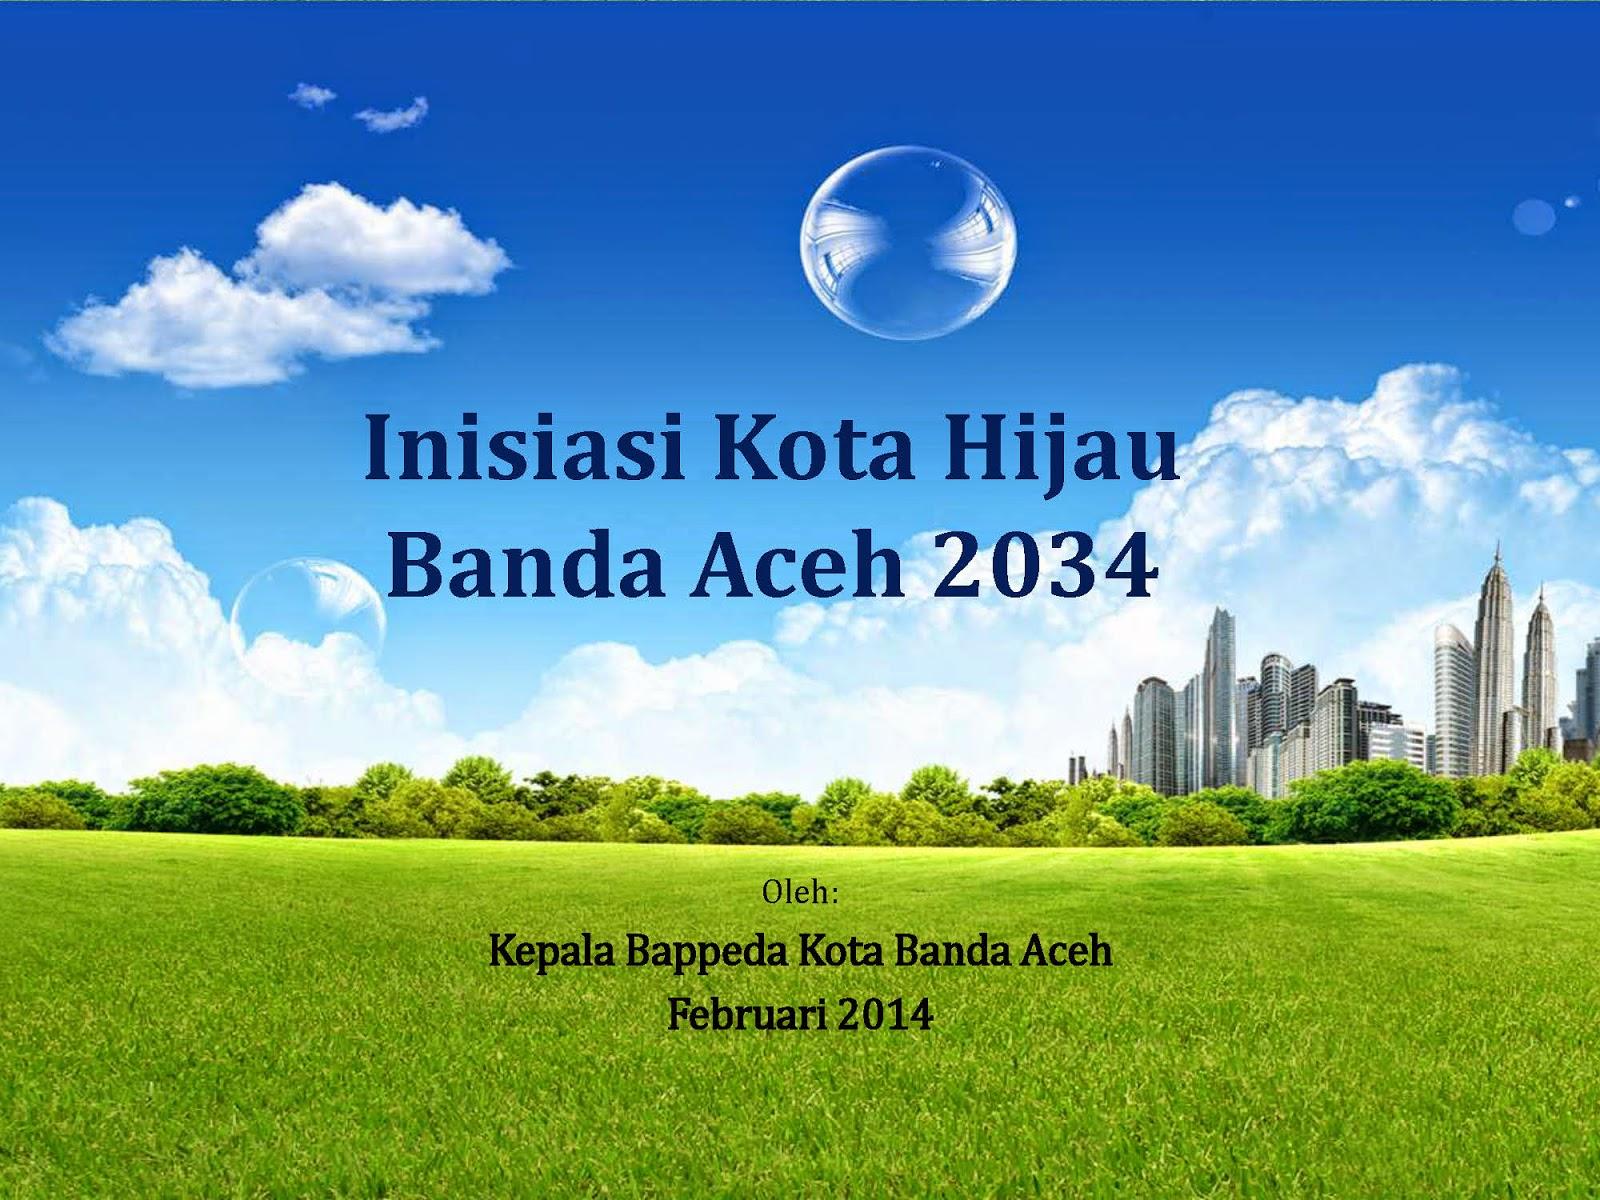 Inisiasi Kota Hijau Banda Aceh 2034